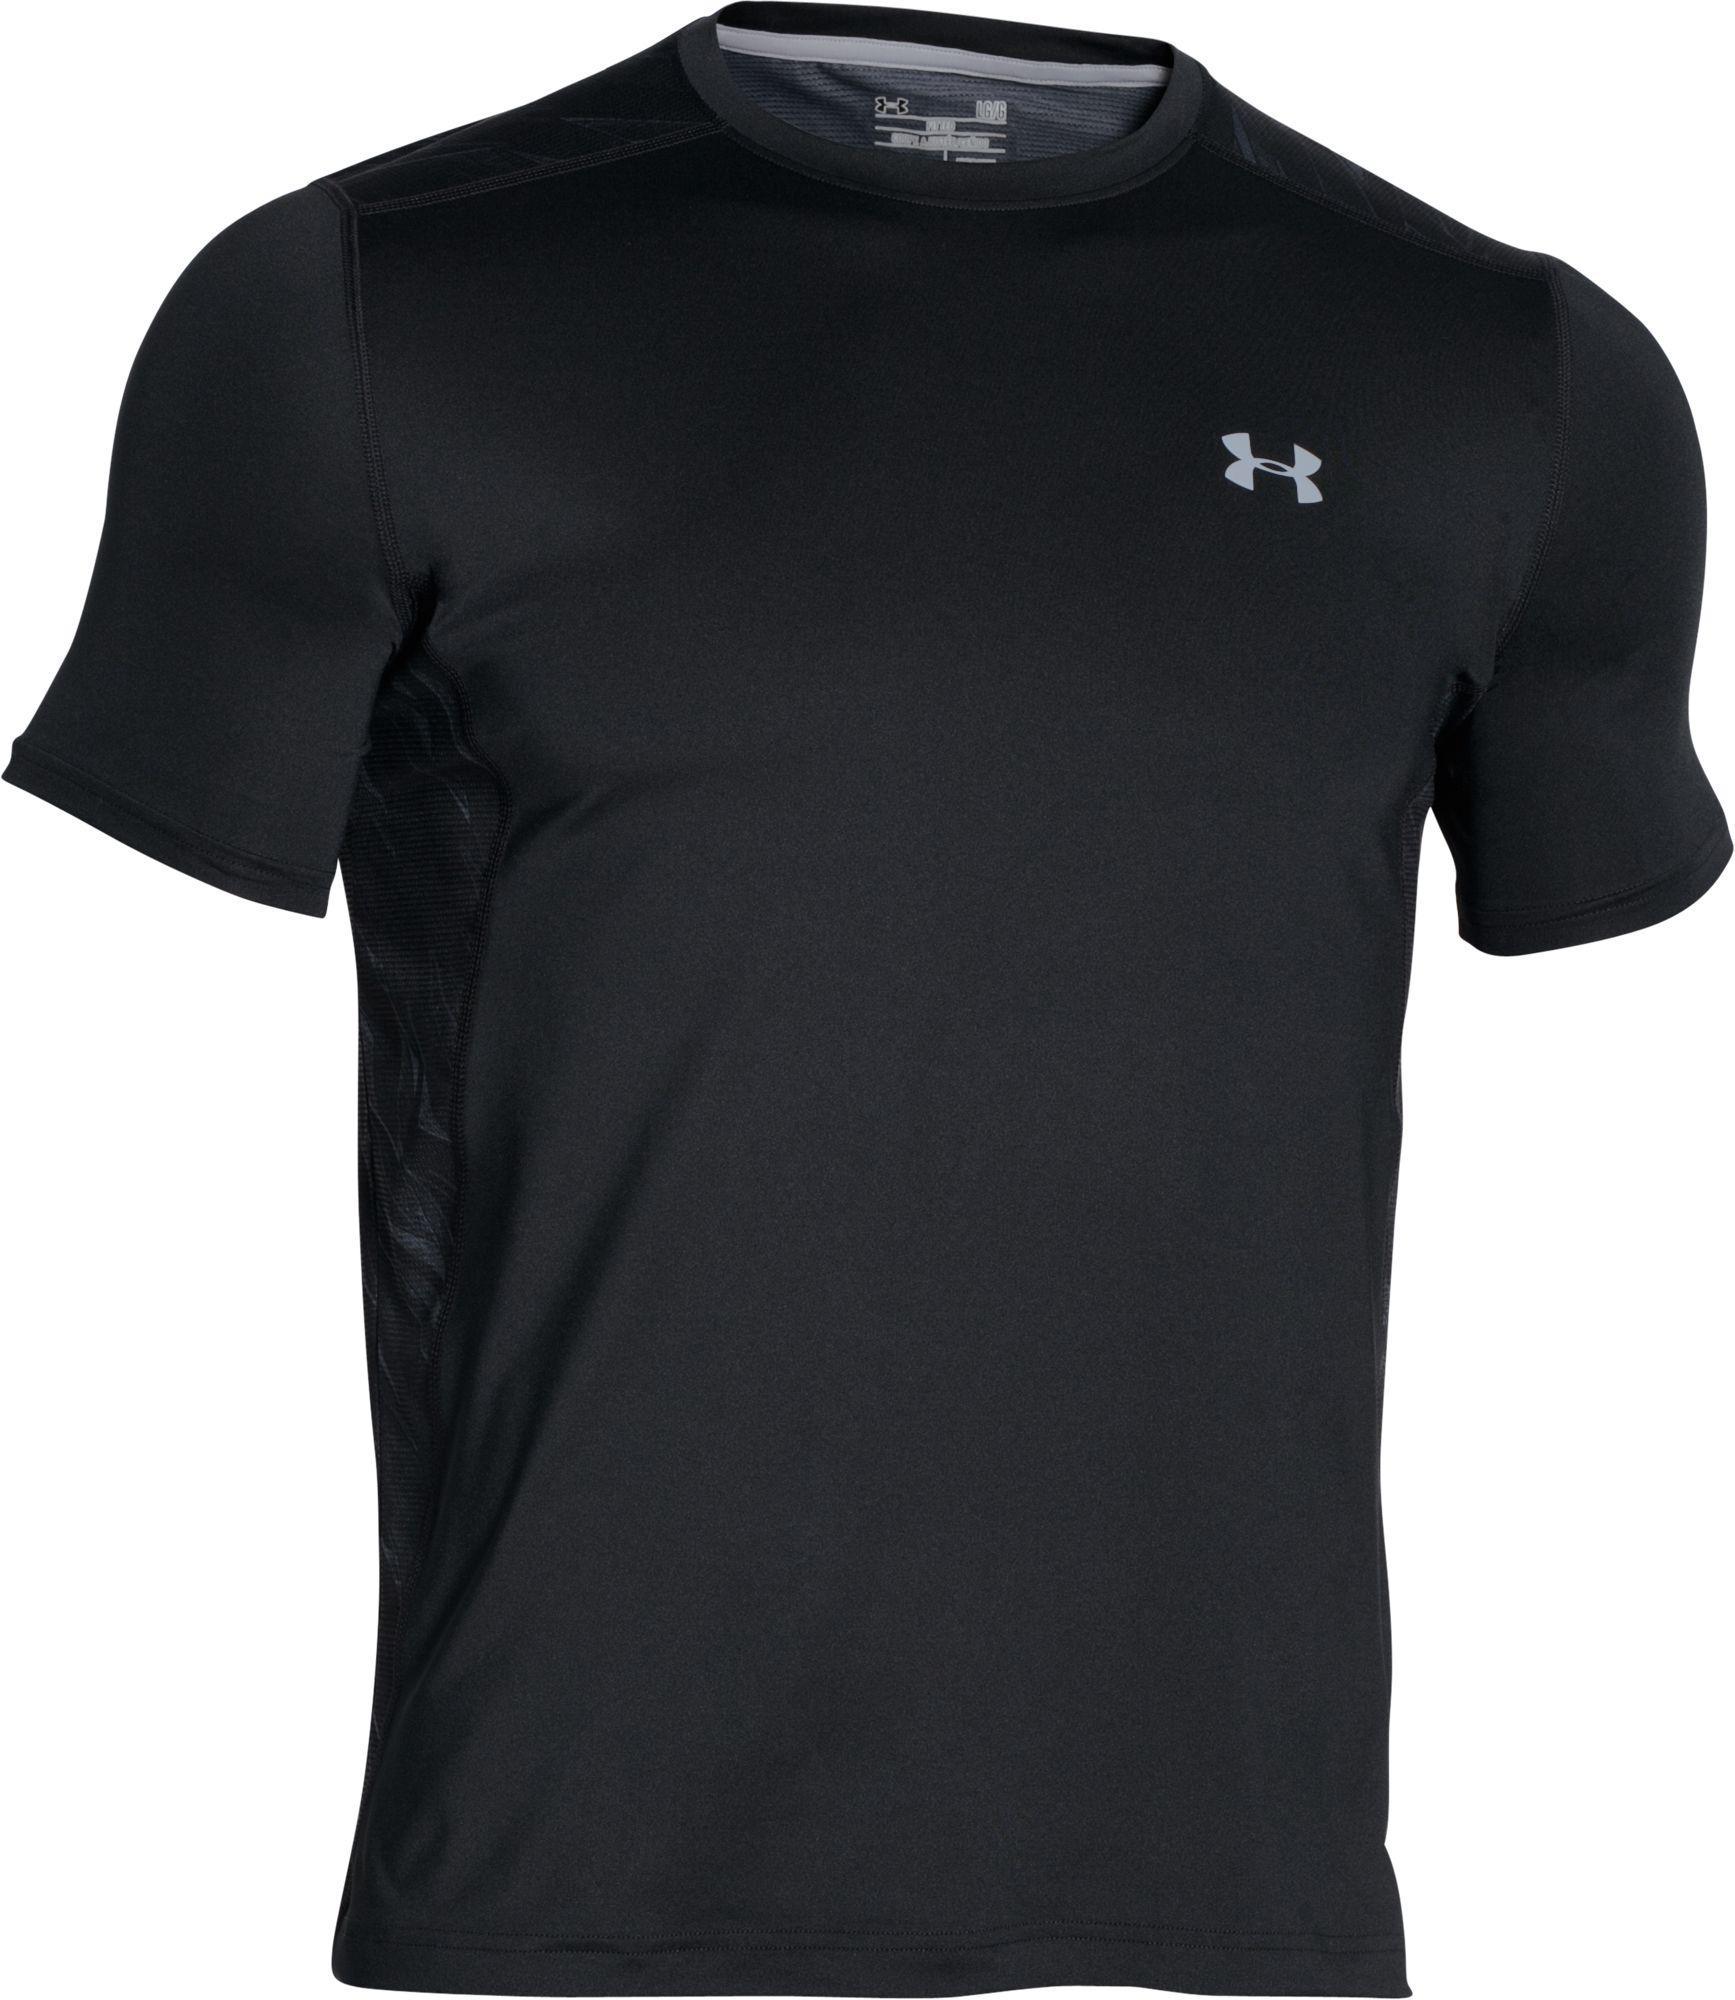 597ec8b8 Lyst - Under Armour Raid T-shirt in Black for Men